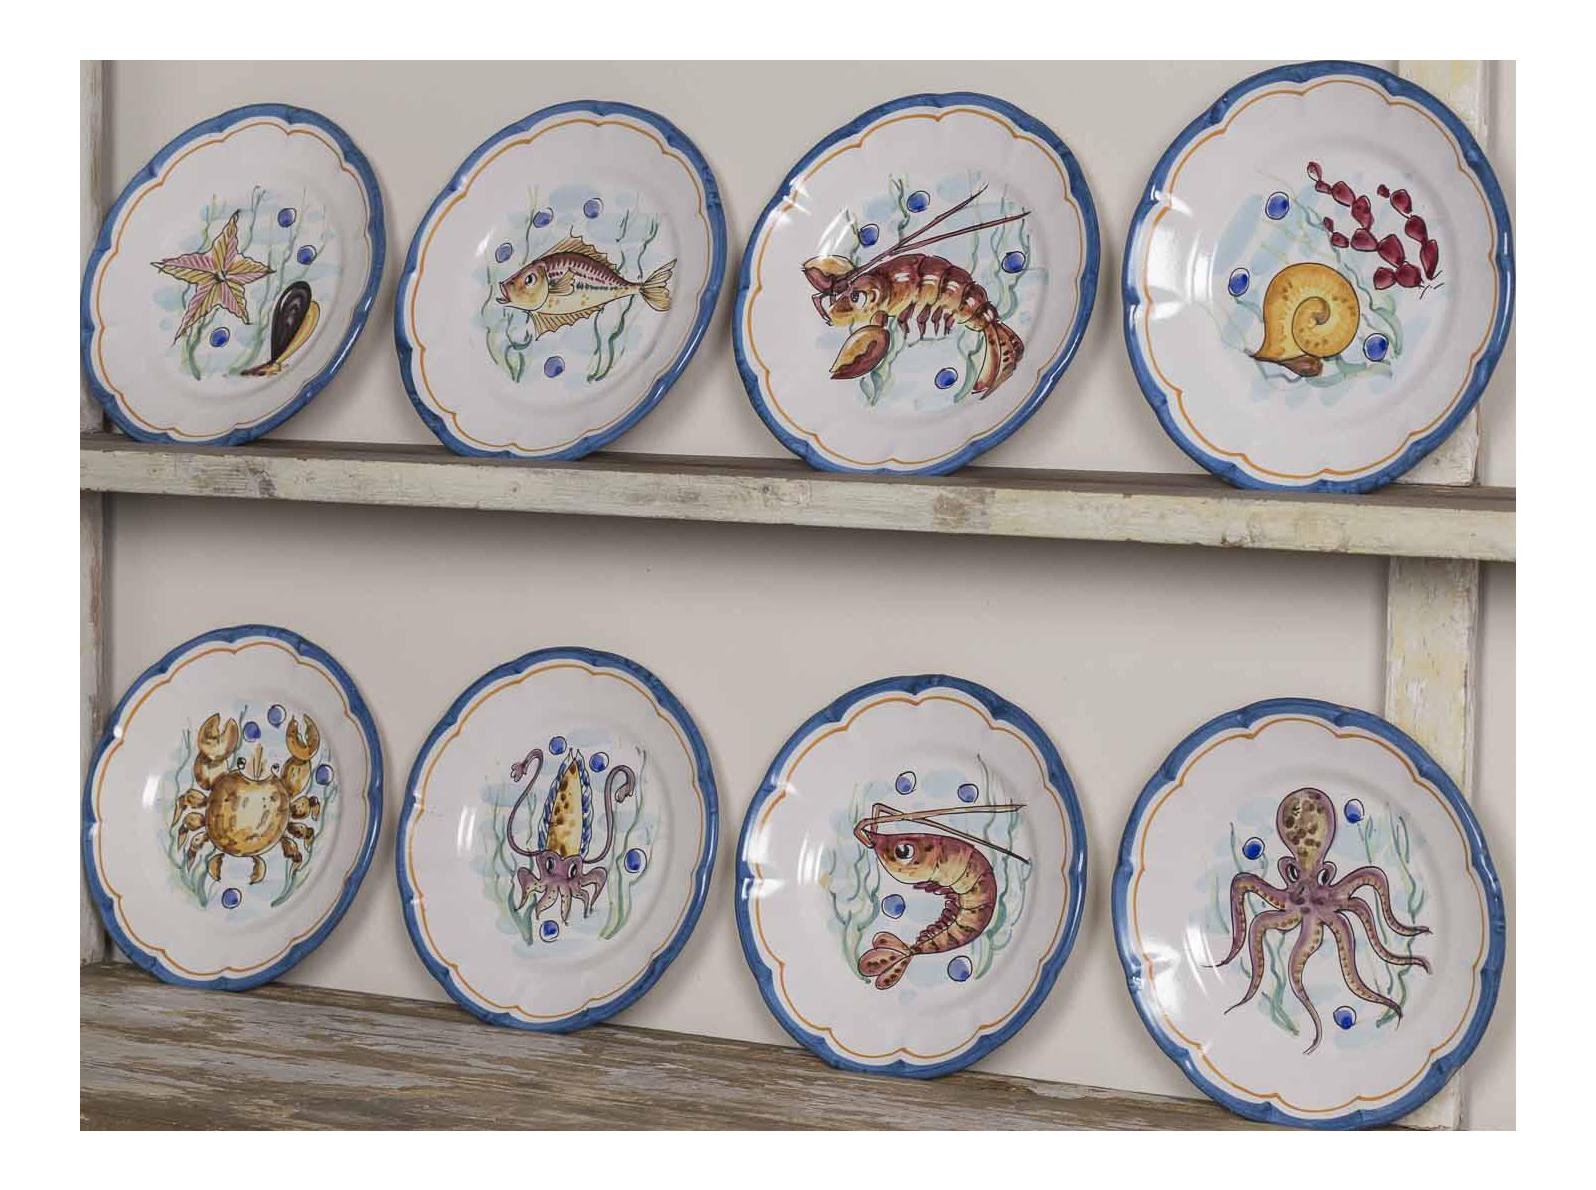 Set Eight Italian Hand Painted Plates Vietri - Image 1 of 11  sc 1 st  Decaso & Distinguished Set Eight Italian Hand Painted Plates Vietri   DECASO